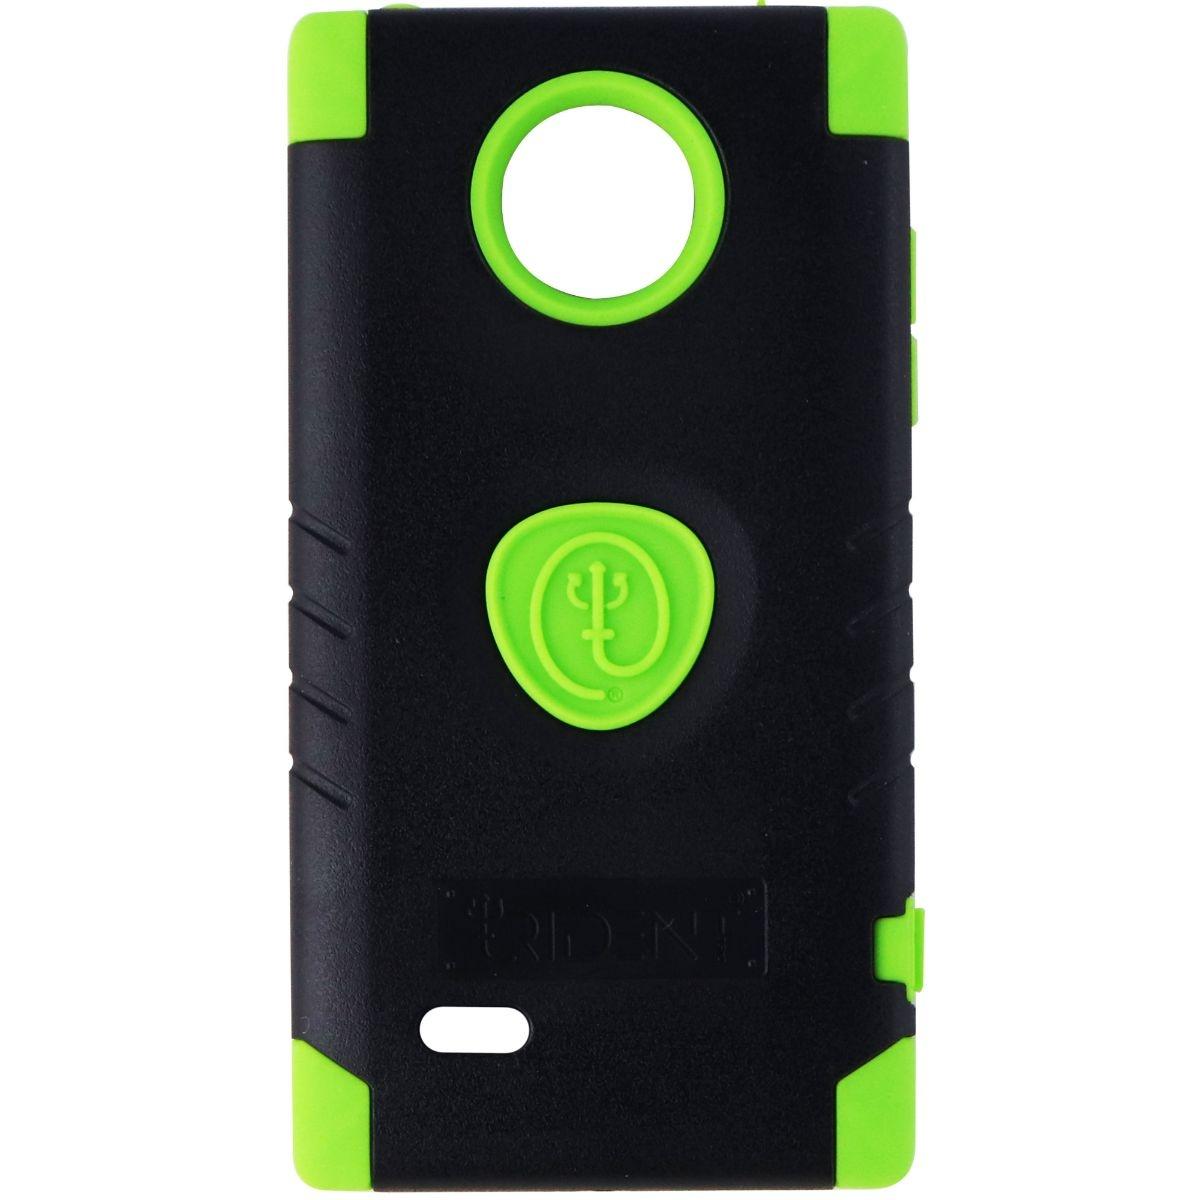 Trident Aegis Series Dual Layer Case for LG Spectrum 2 - Black/Green